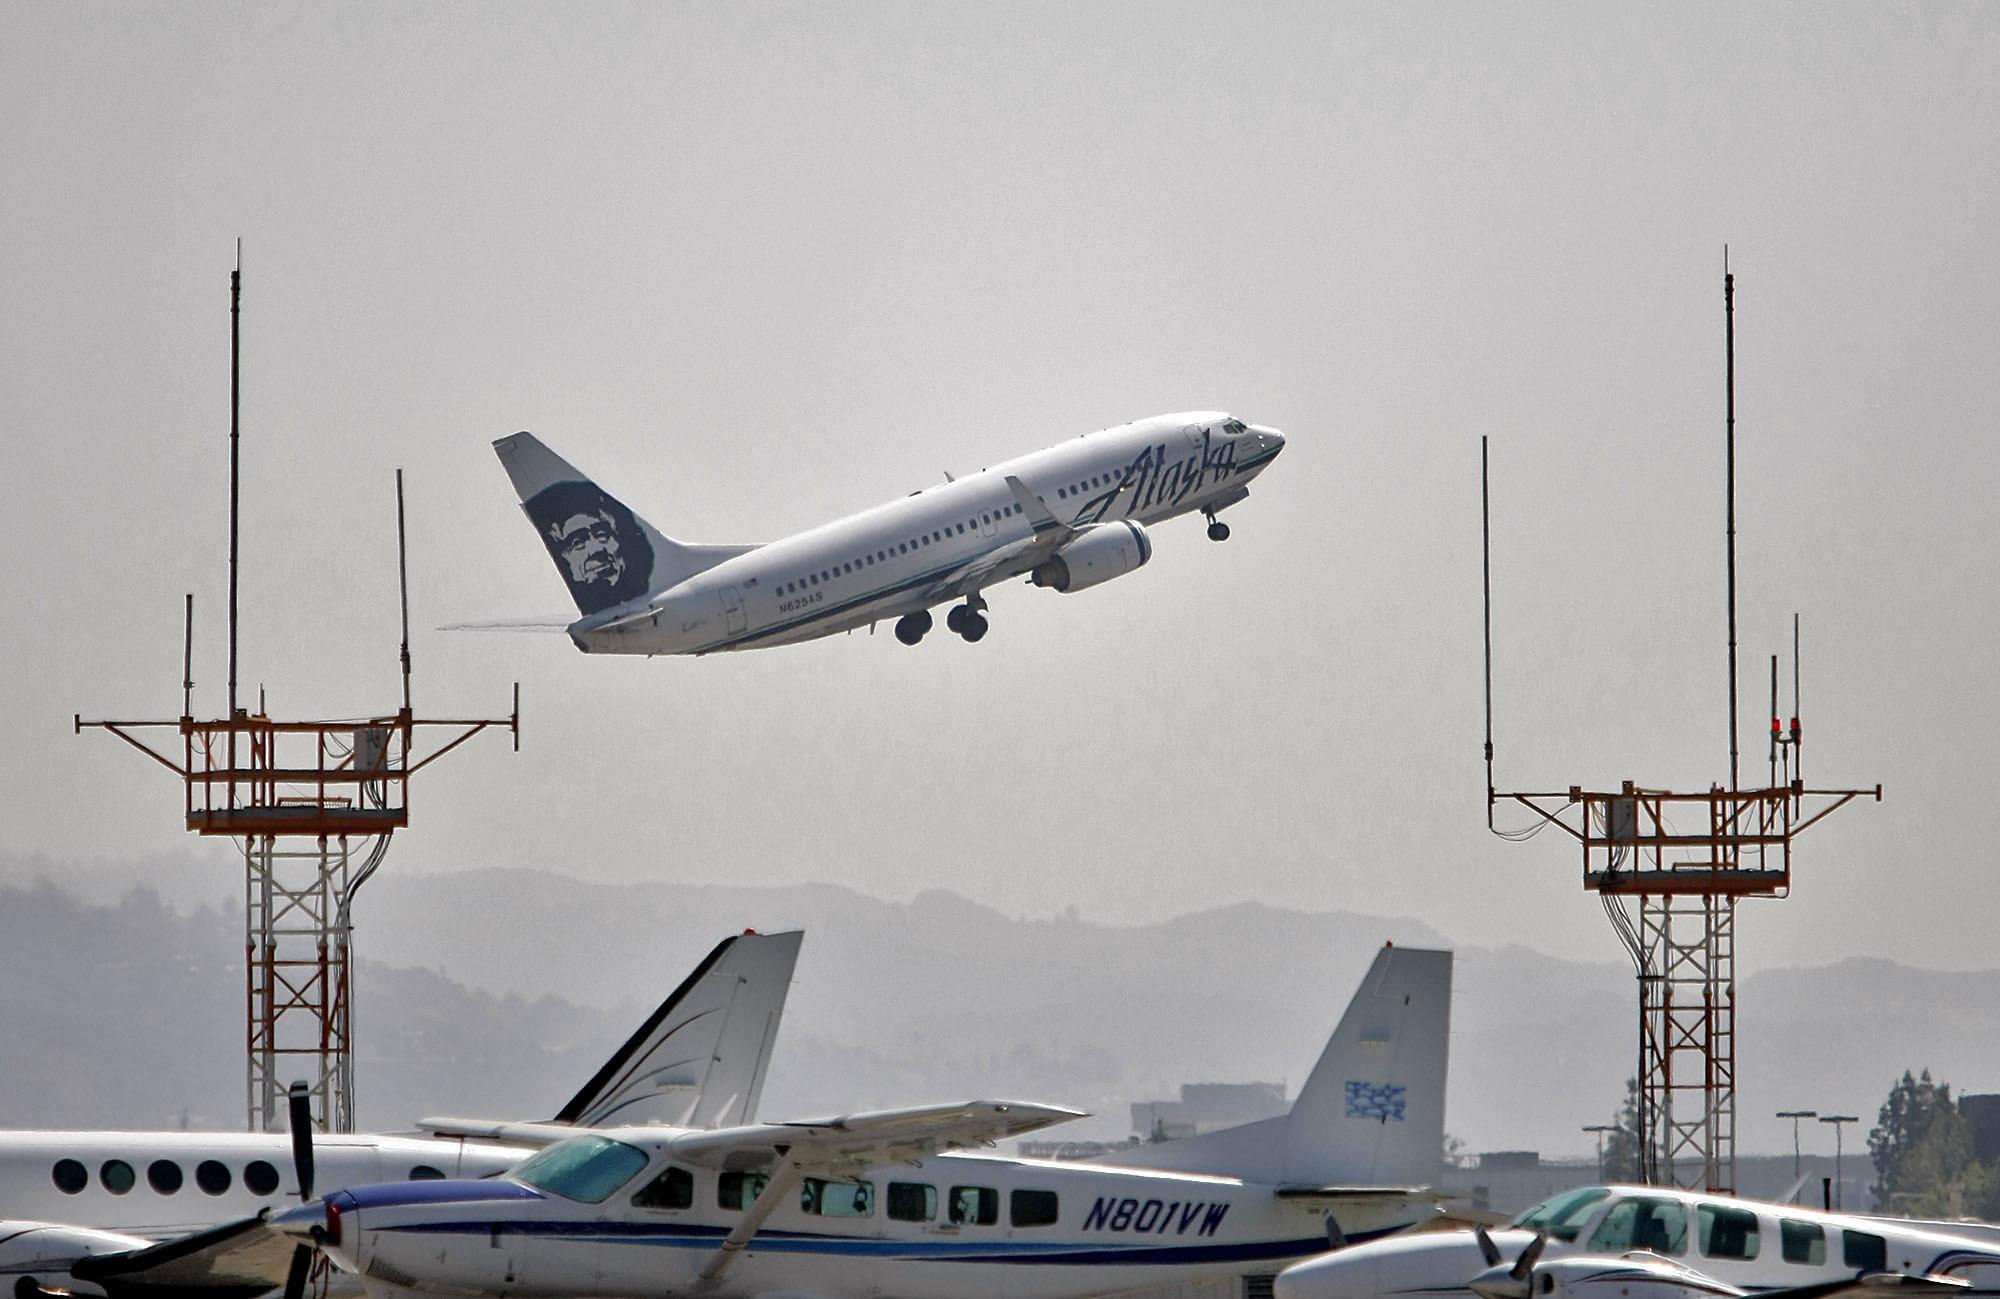 Flight Attendants Sue Boeing Over Toxic Fumes On Alaska